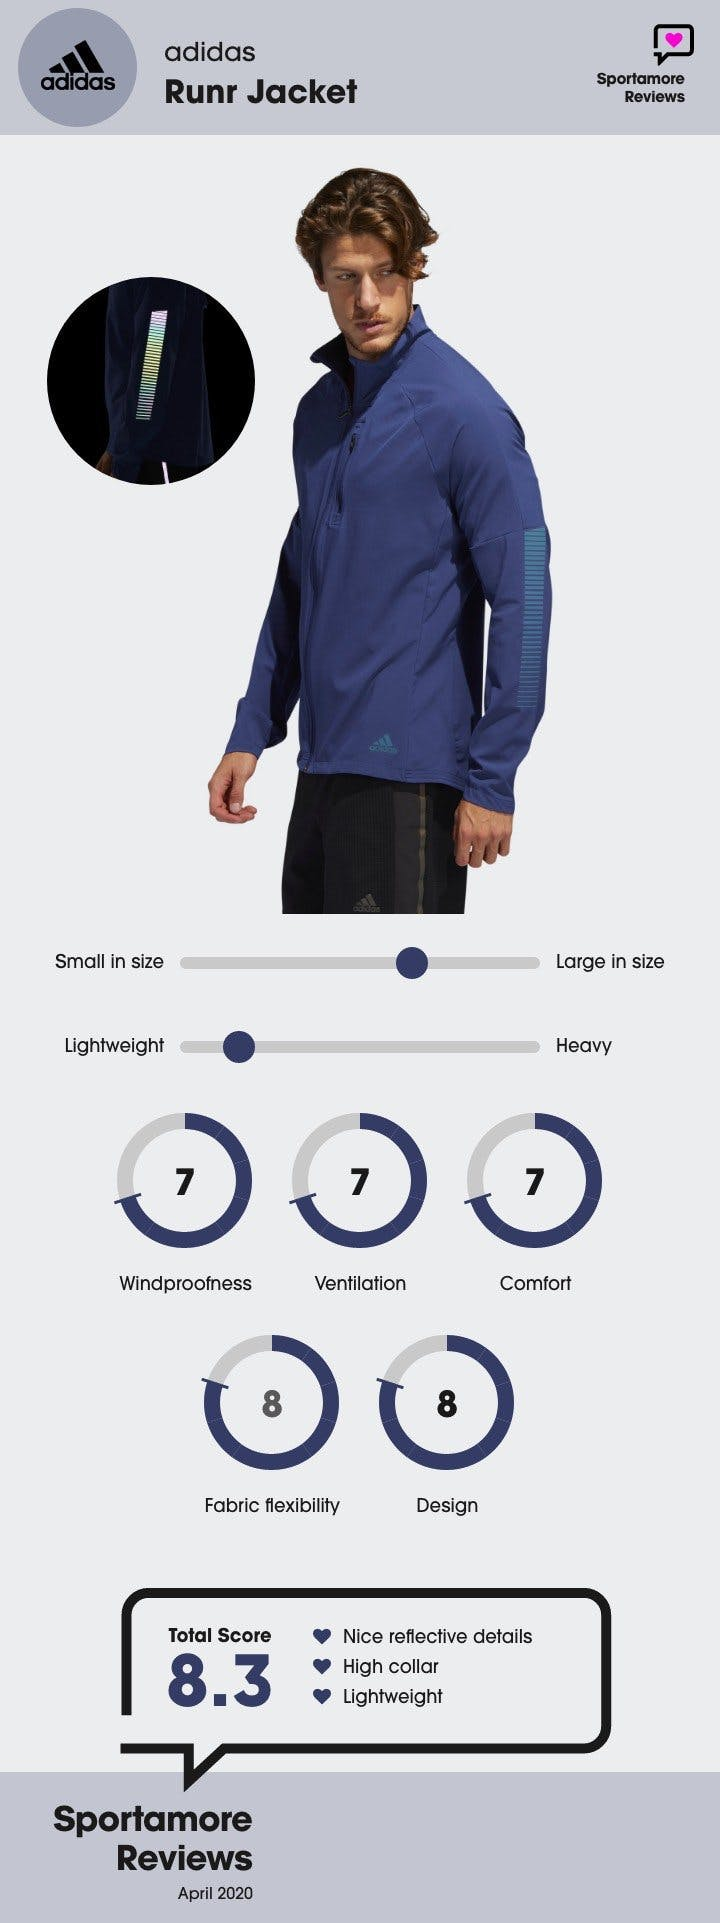 Herr - adidas Runr Jacket.jpg